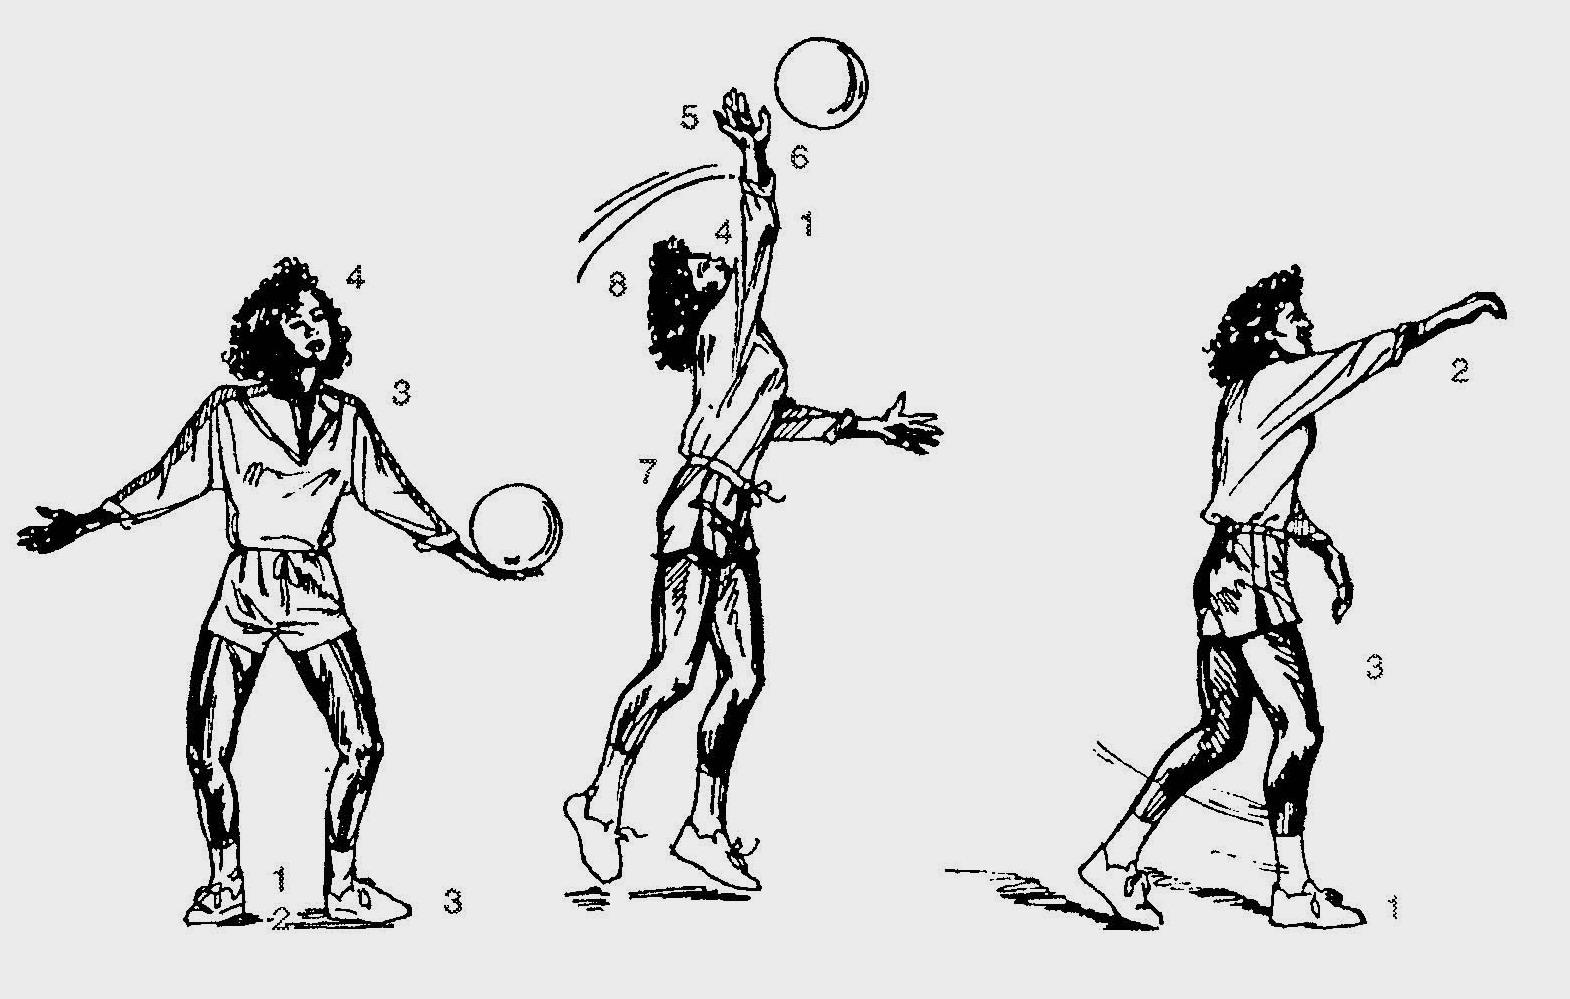 волейбол схема 4 2